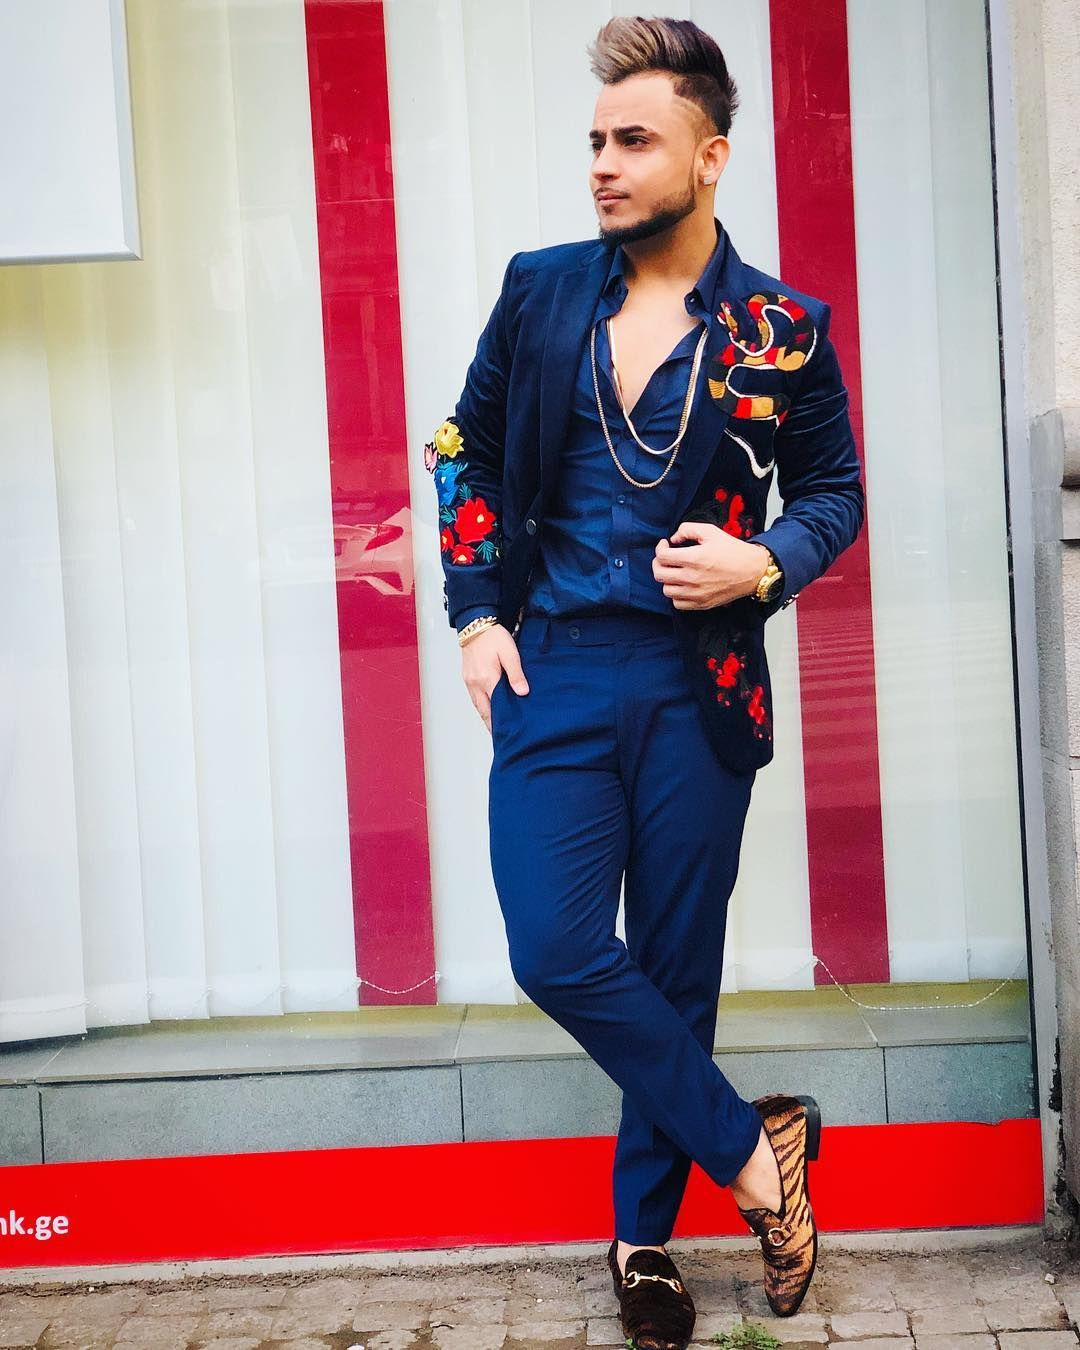 ", BLESSED?? on Instagram: ""Naye Saal Ka Naya Gaana !  #SheDontKnow  Exclusive Wardrobe By @bradaddiction ??♂️ Dropping Soon @tseries.official ? #MusicMG"", My Pop Star Kda Blog, My Pop Star Kda Blog"